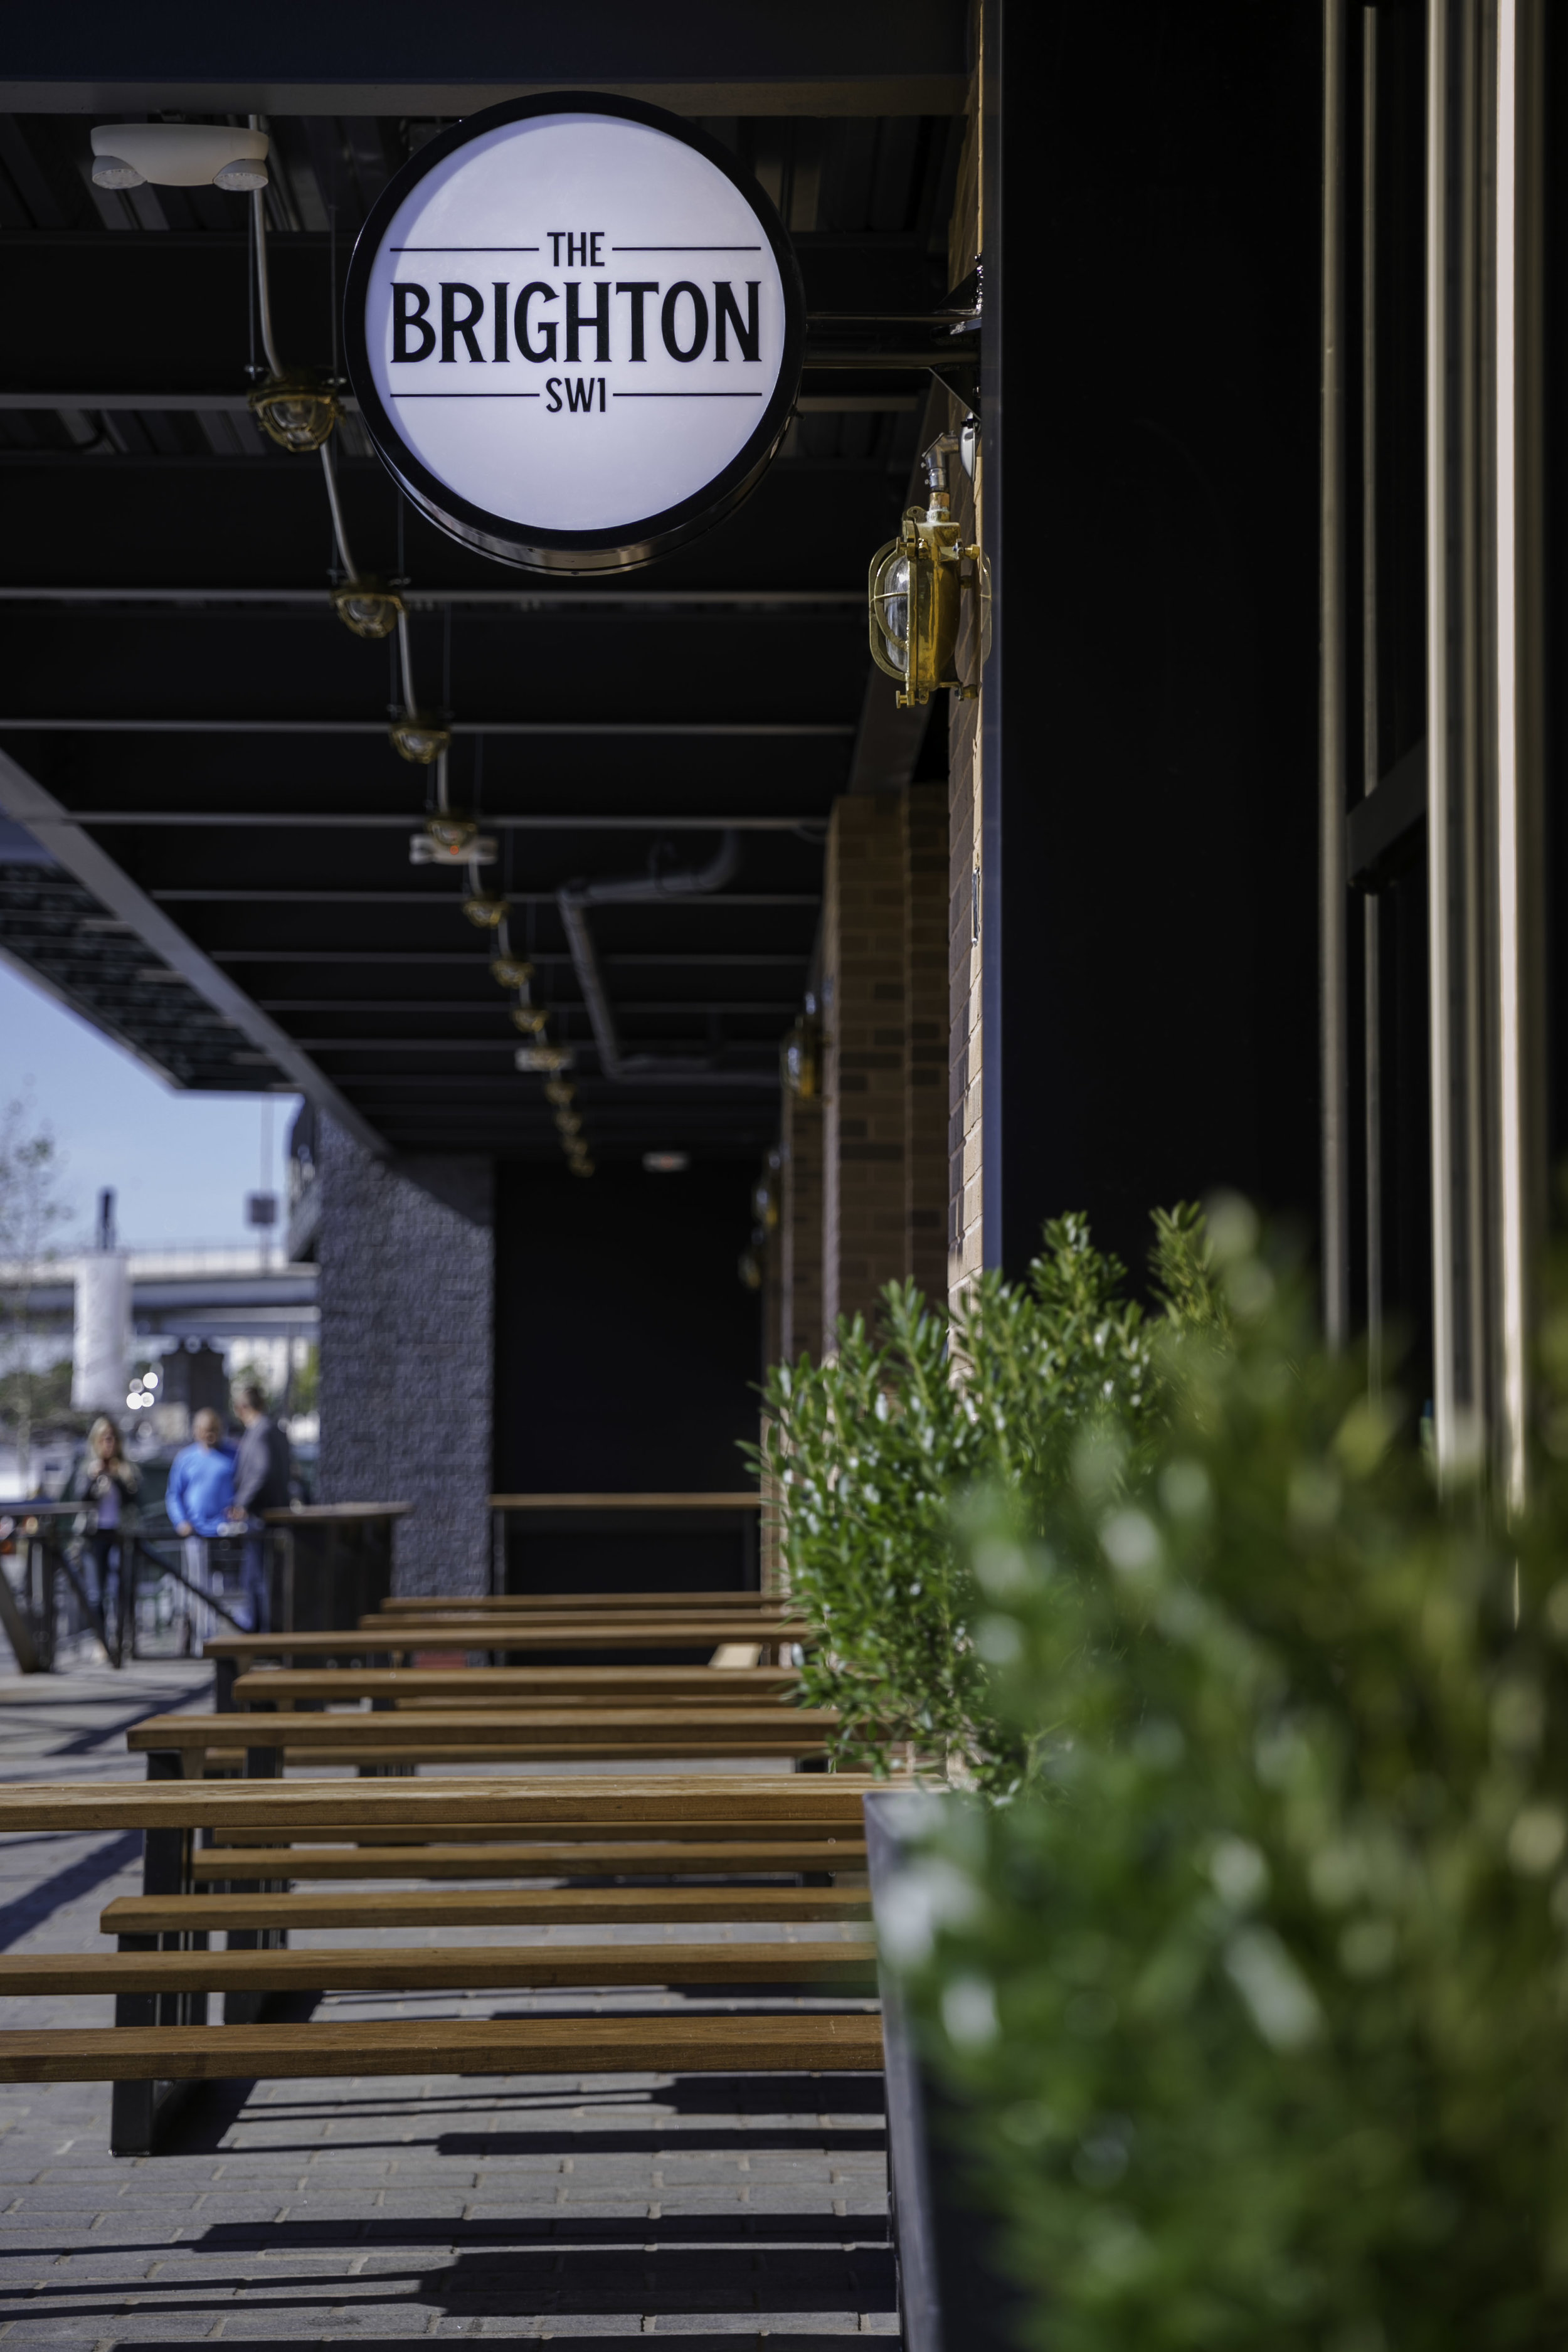 studio-saint-bars-and-restaurants-the-brighton-washington-dc-9